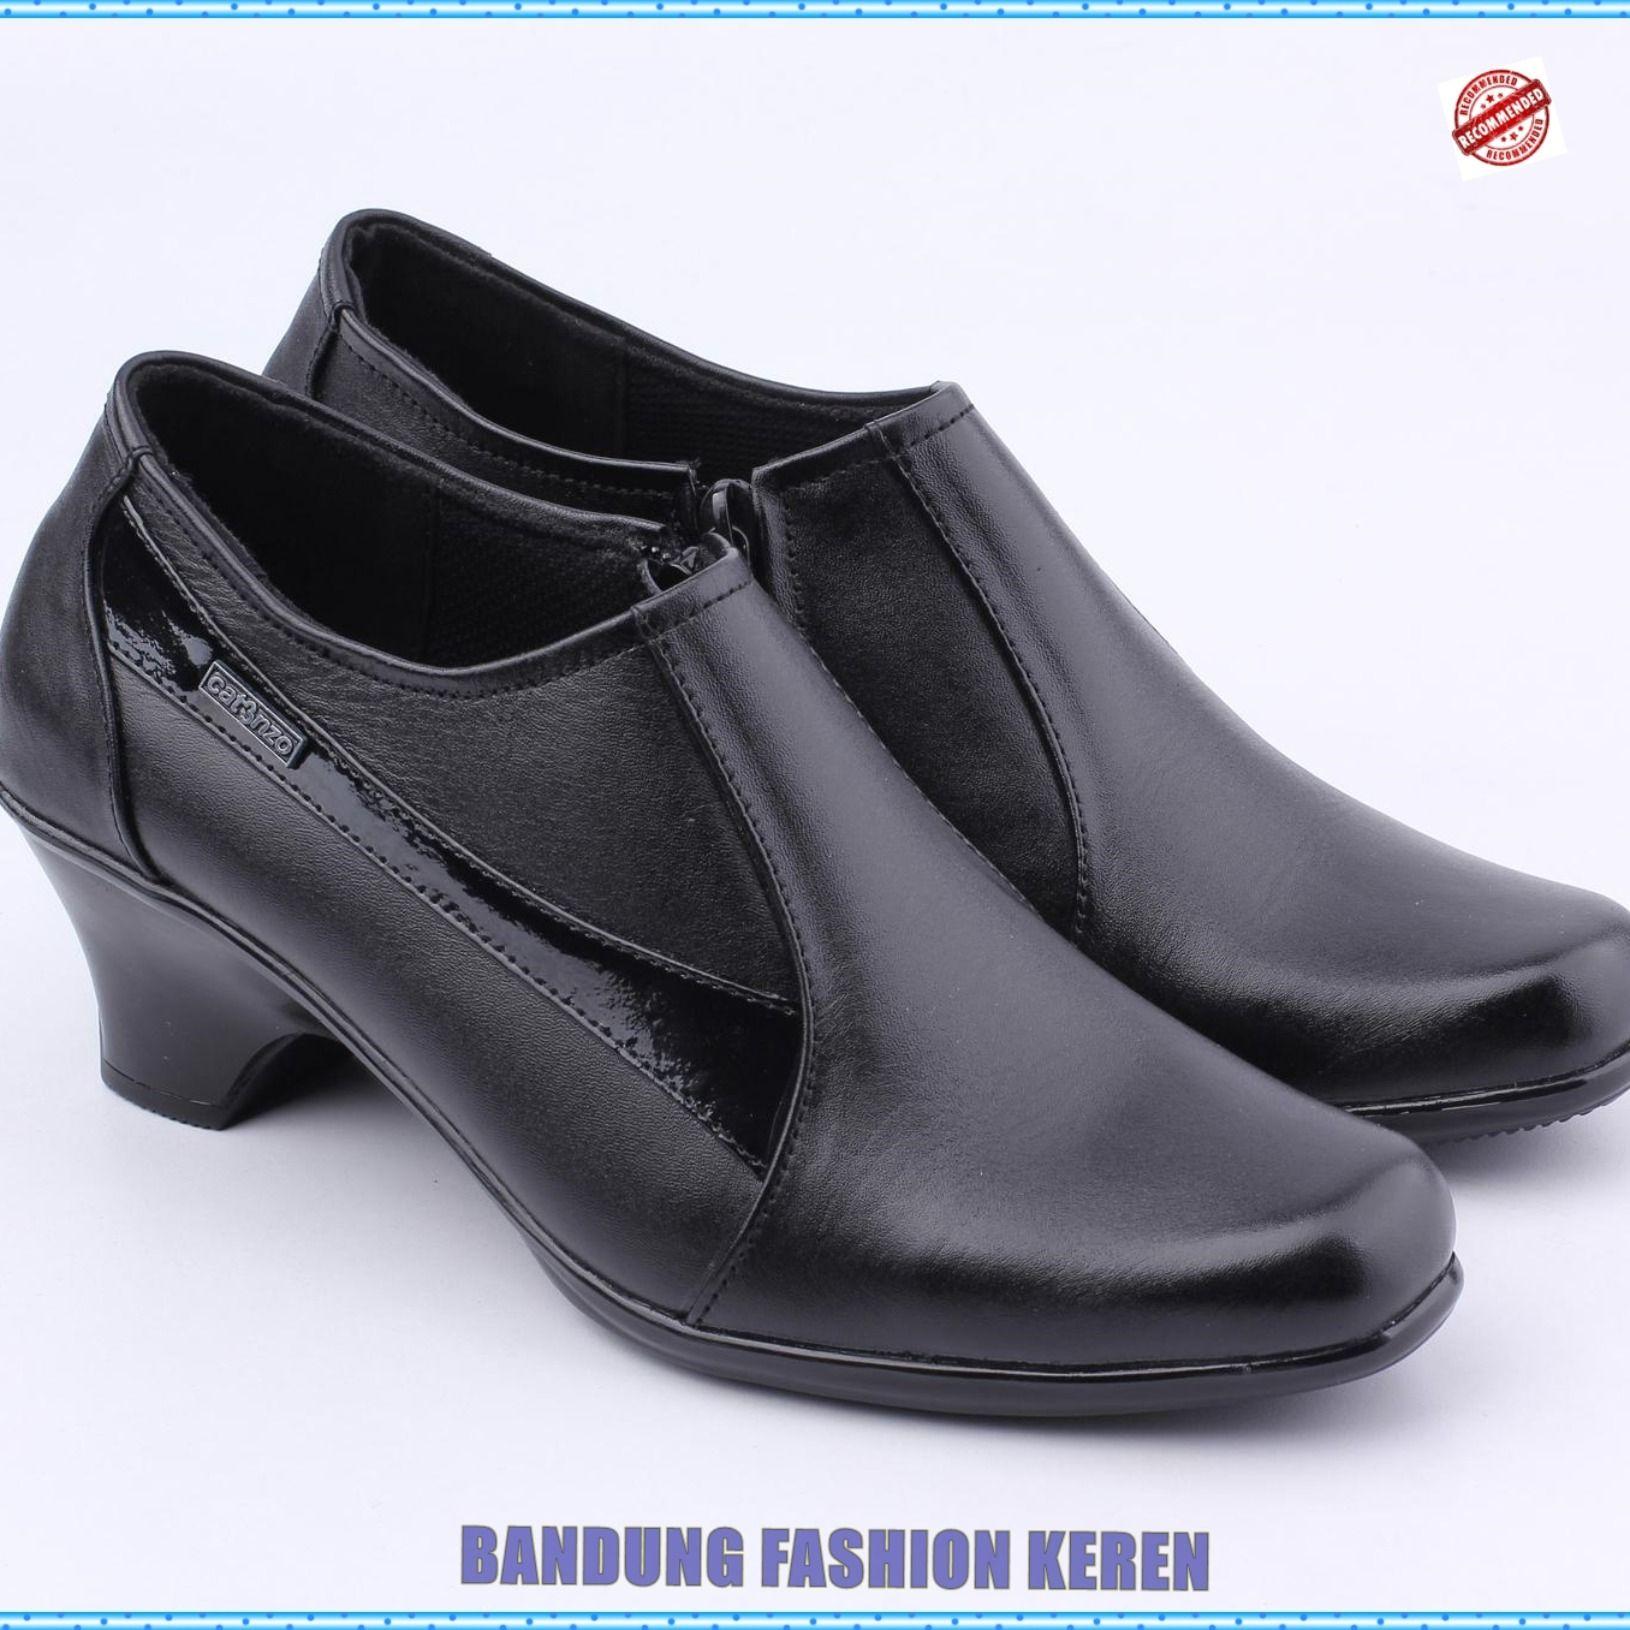 Sepatu Boot Wanita Us 025 Produk Fashion Handmade Terbaik 100